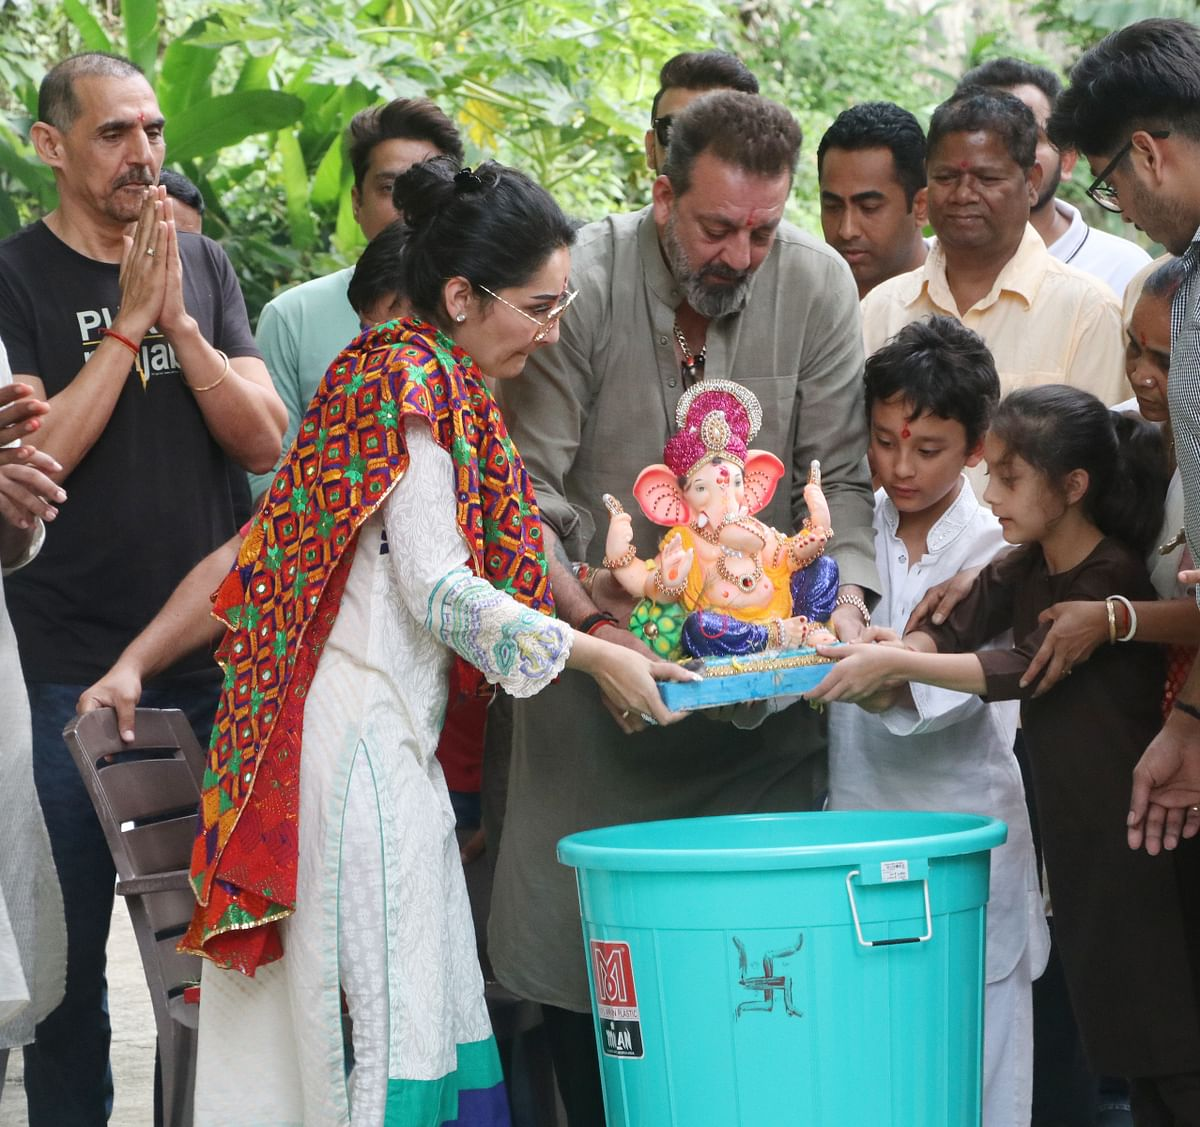 Sanjay Dutt and family during Ganpati visarjan.